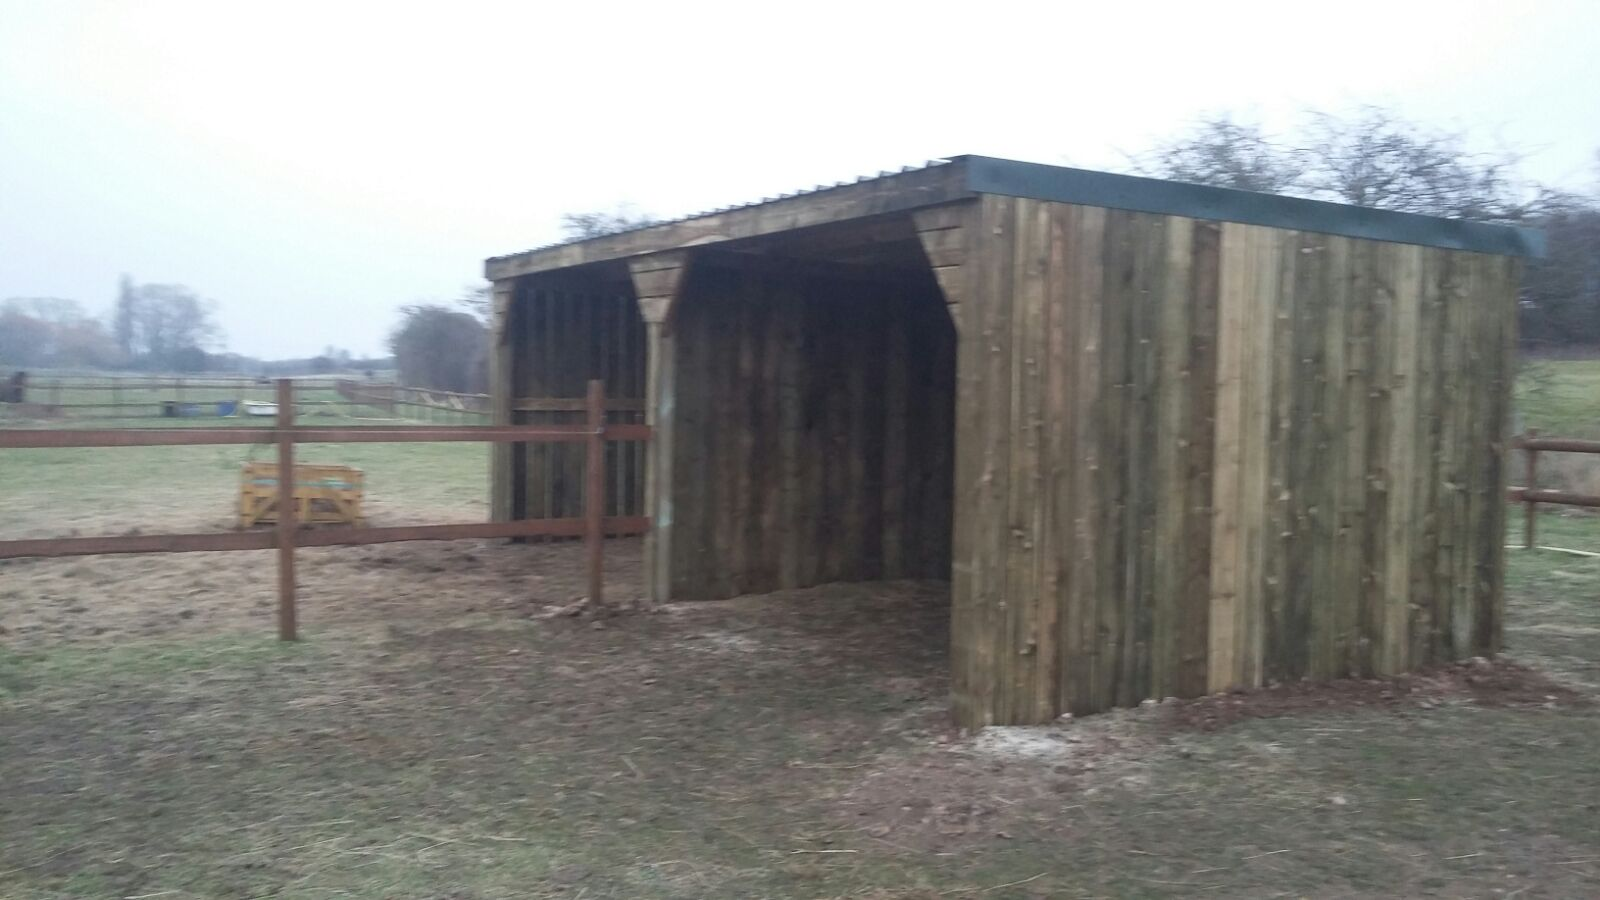 Equestrian Horse Shelter